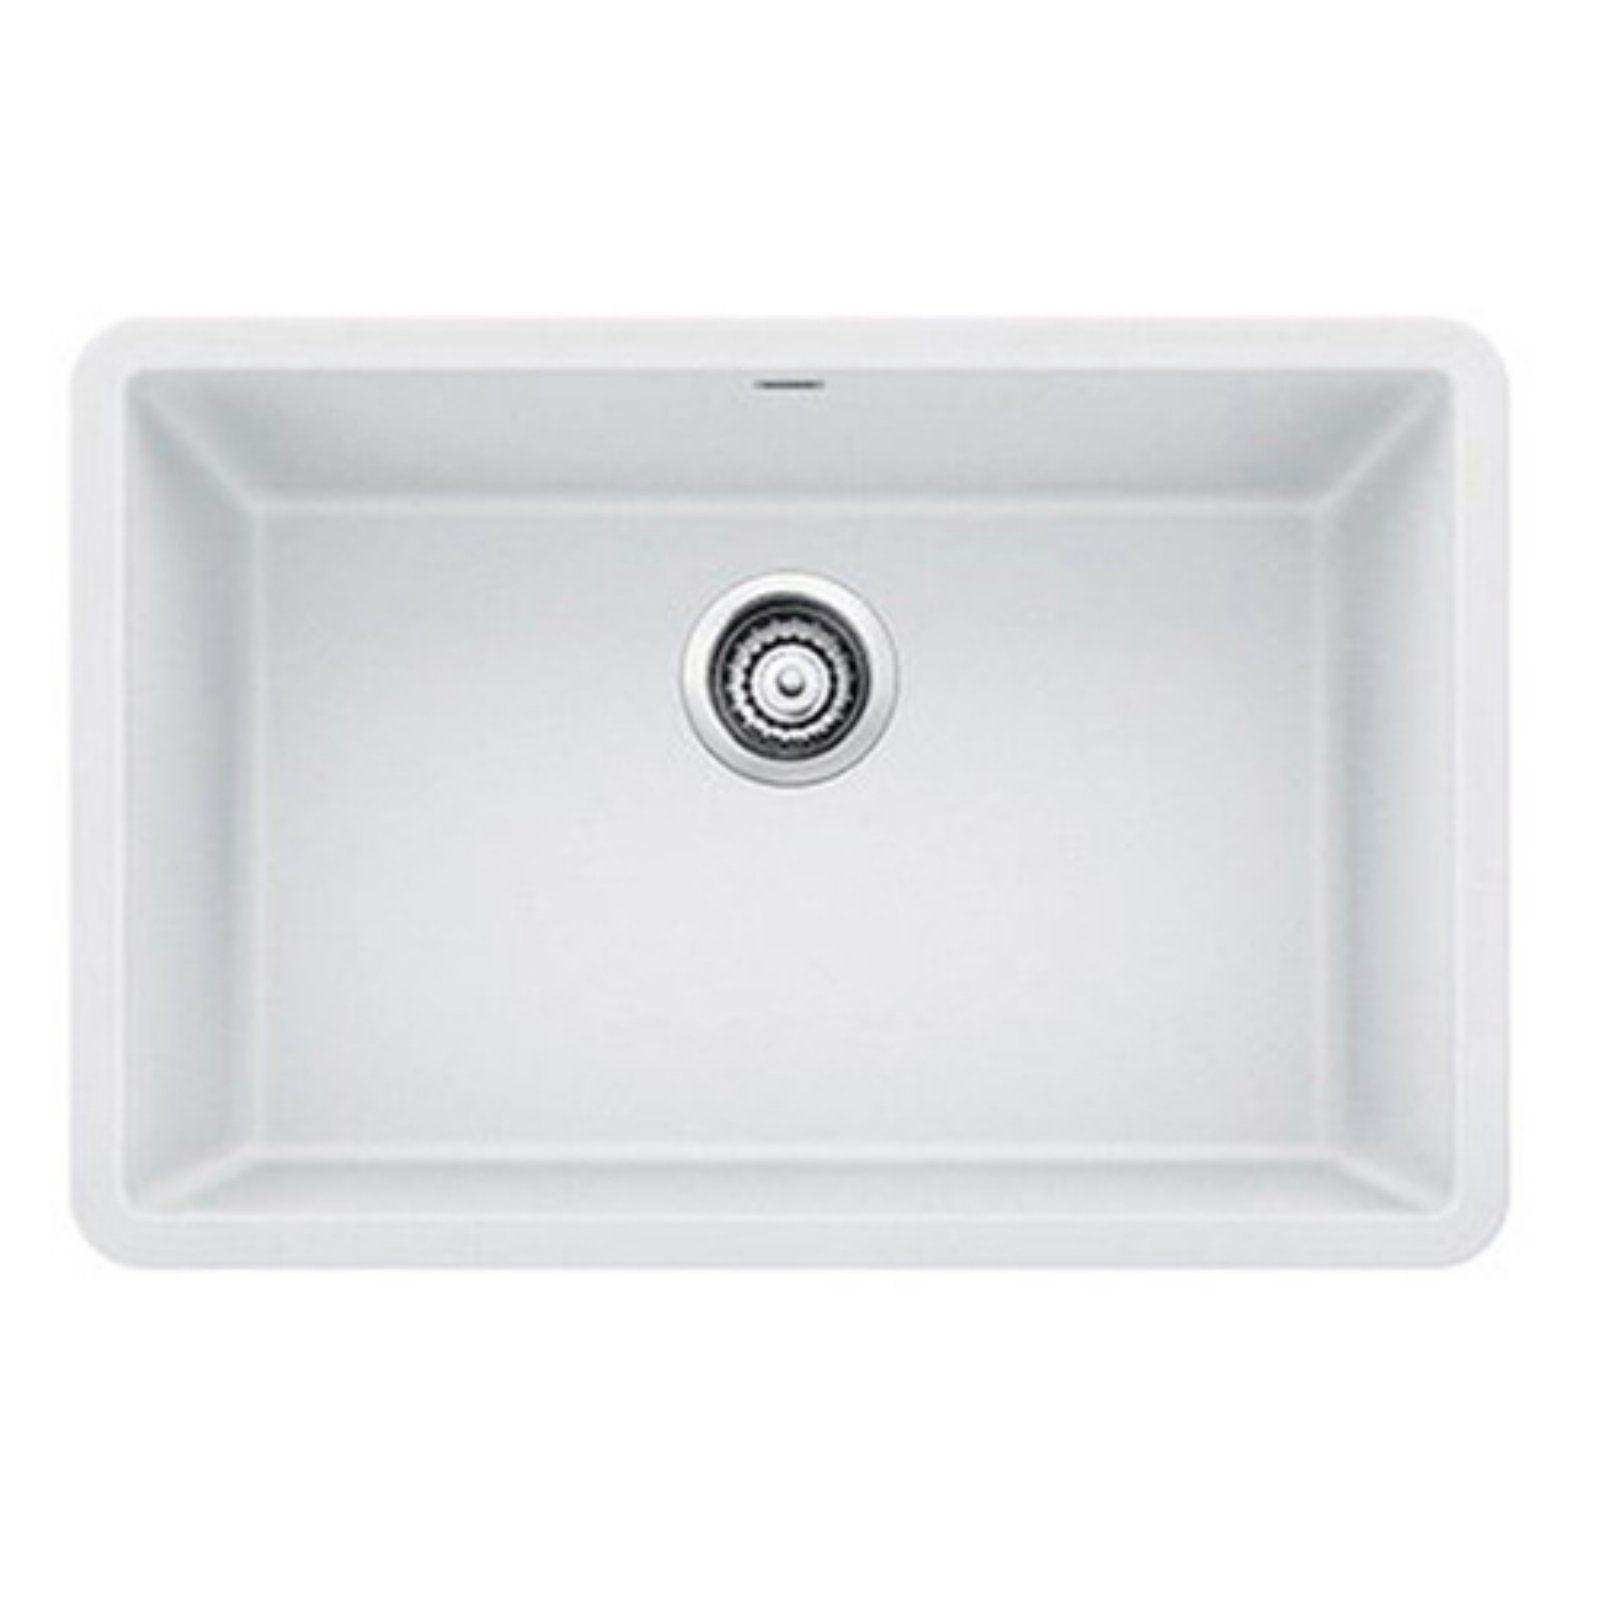 Blanco Precis Ii Undermount Bathroom Sink Products In 2019